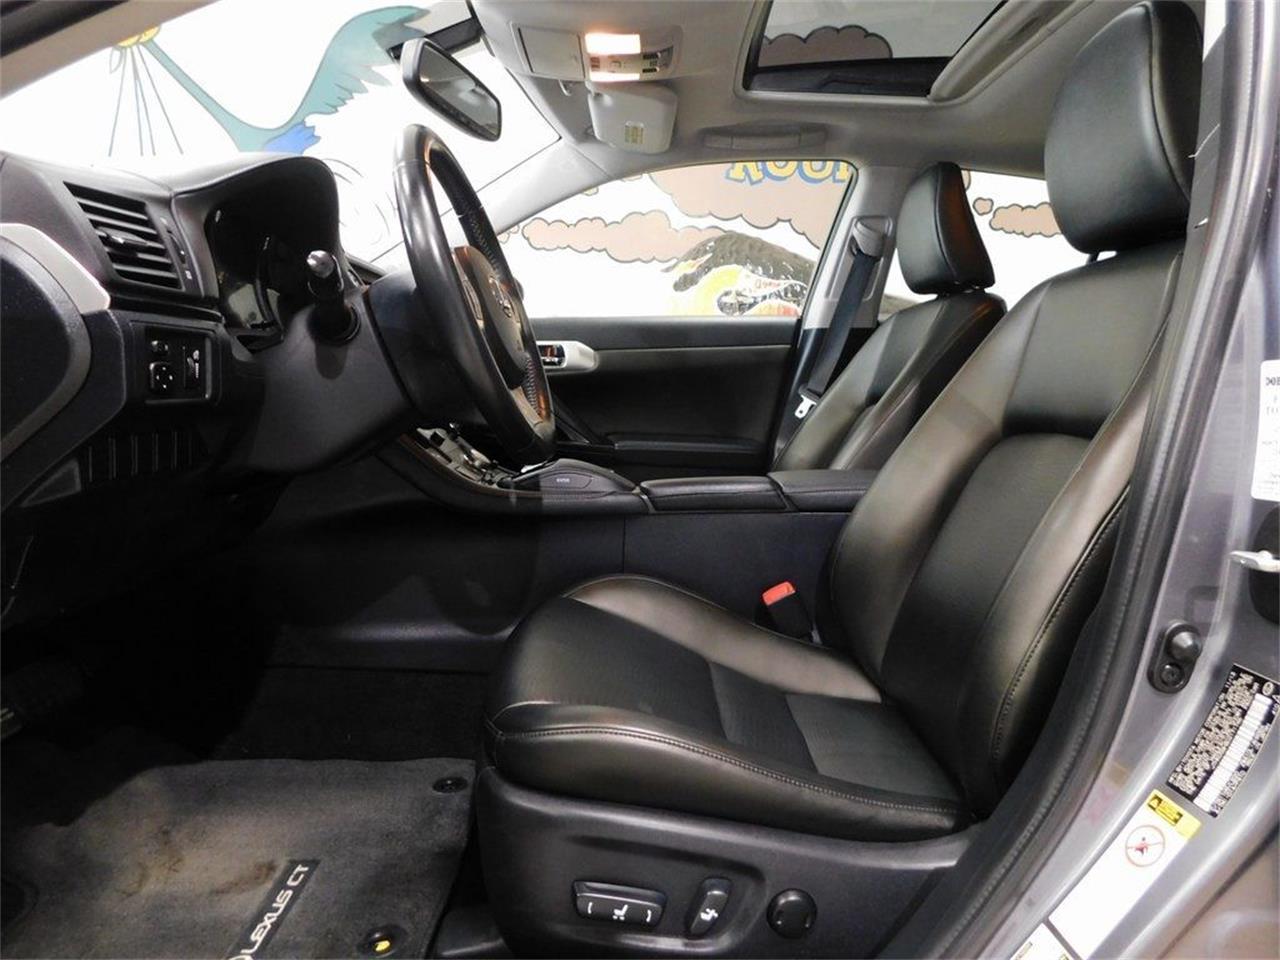 2013 Lexus SC300 (CC-1422454) for sale in Hamburg, New York